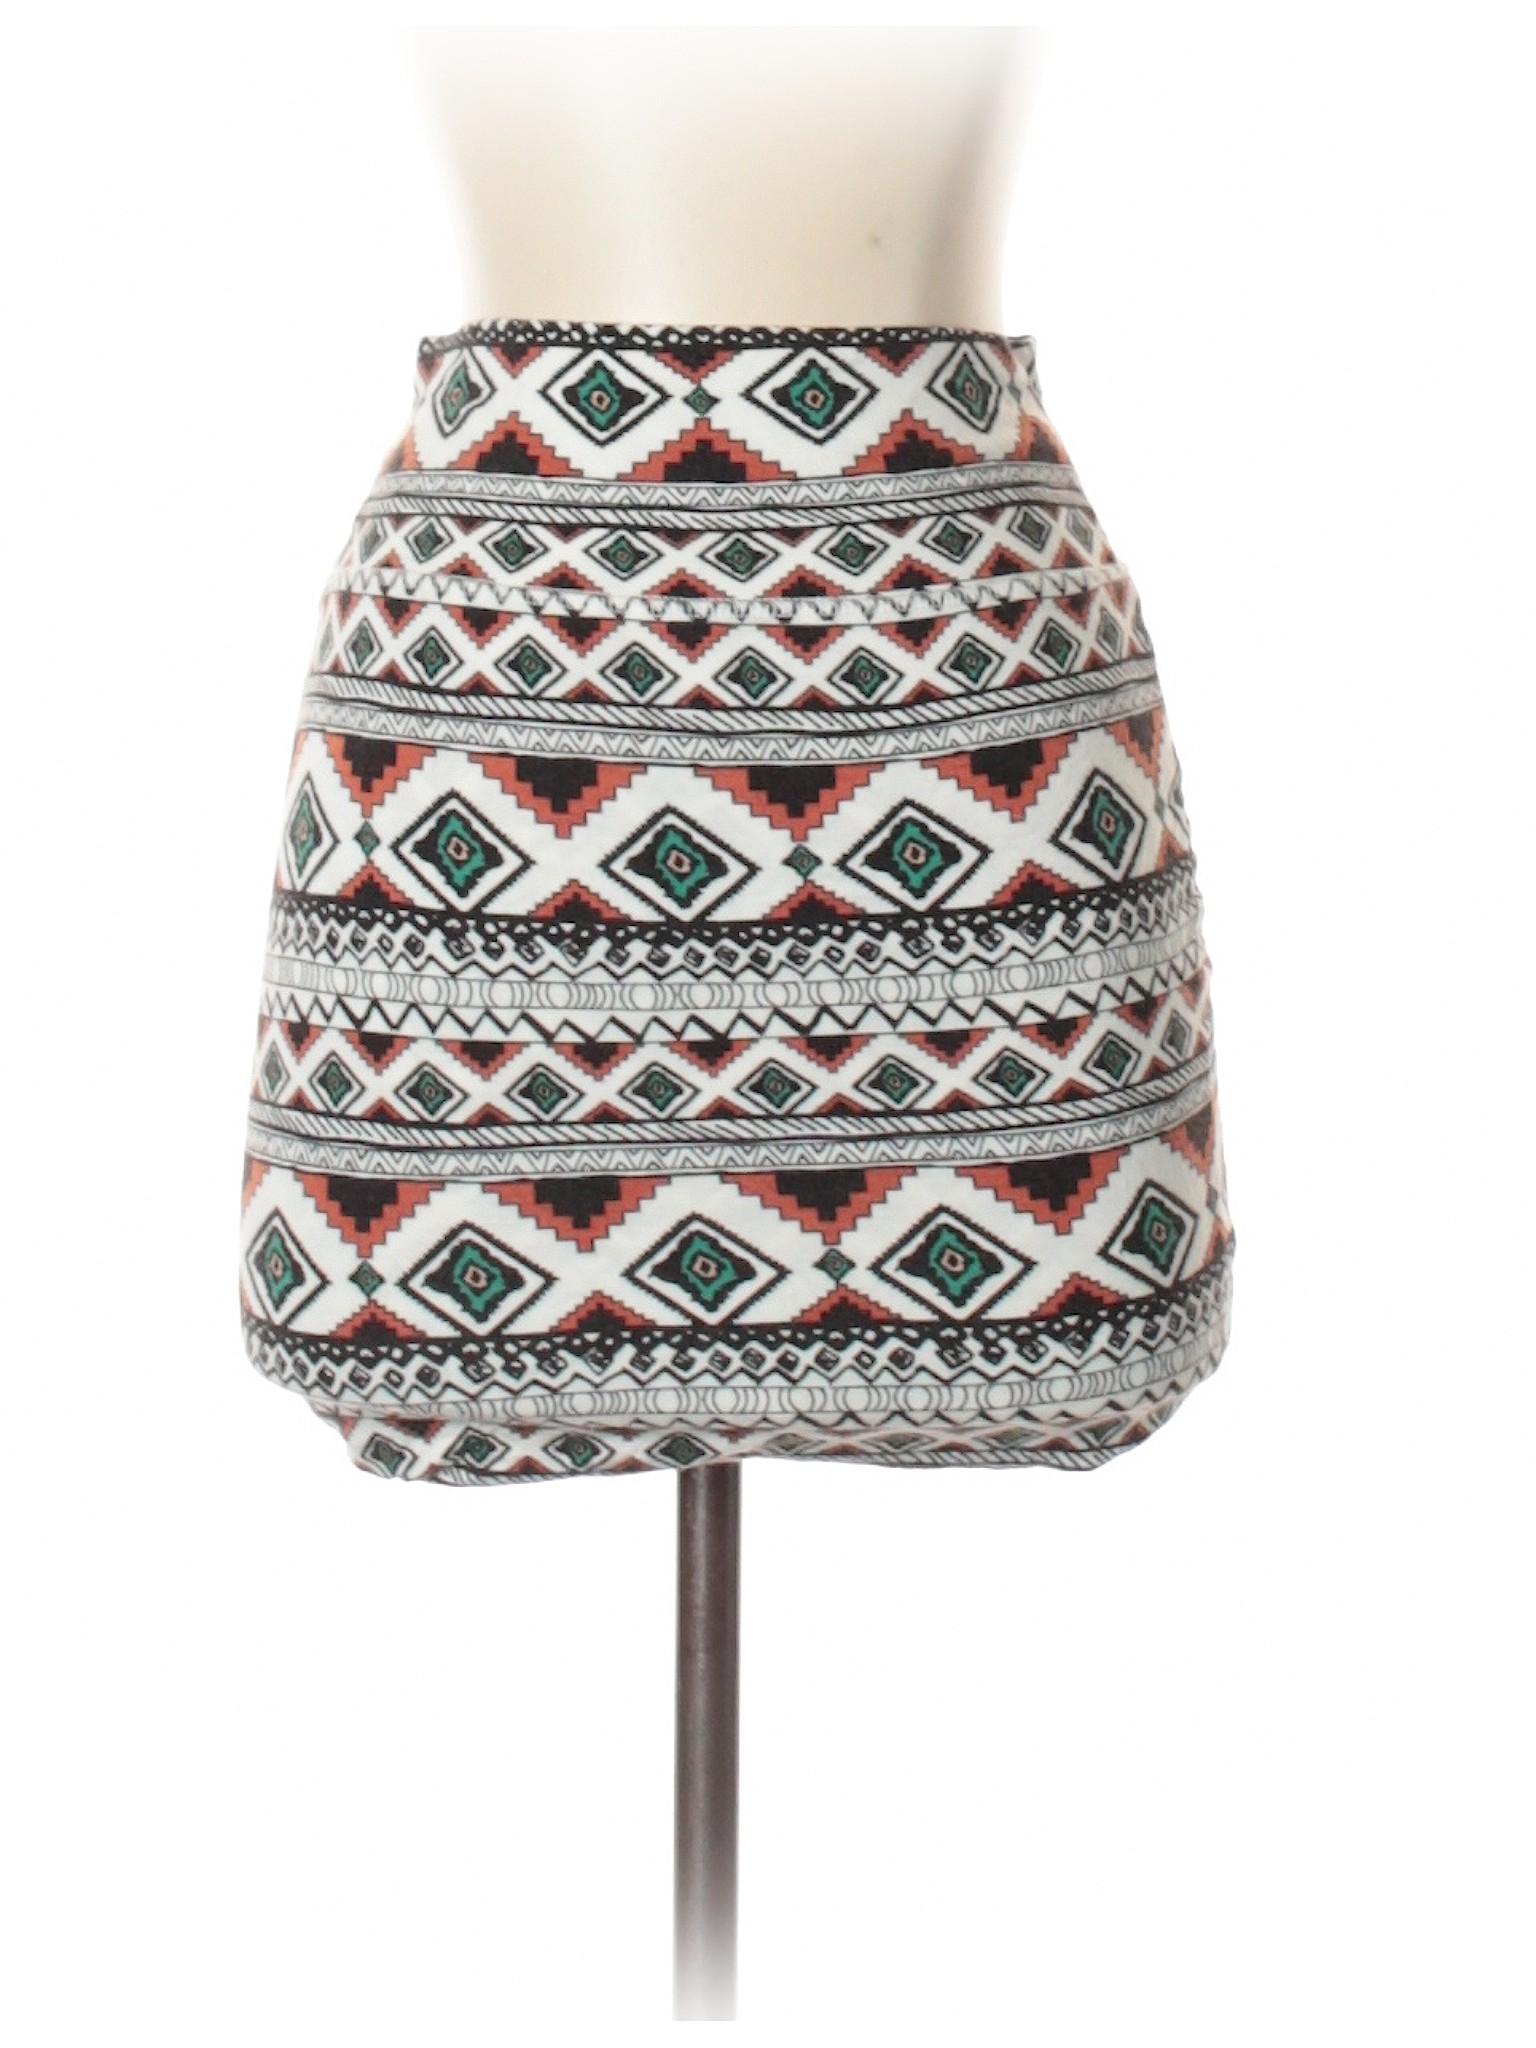 Boutique Casual Skirt Casual Casual Casual Boutique Boutique Boutique Skirt Skirt WCYnC4qcw